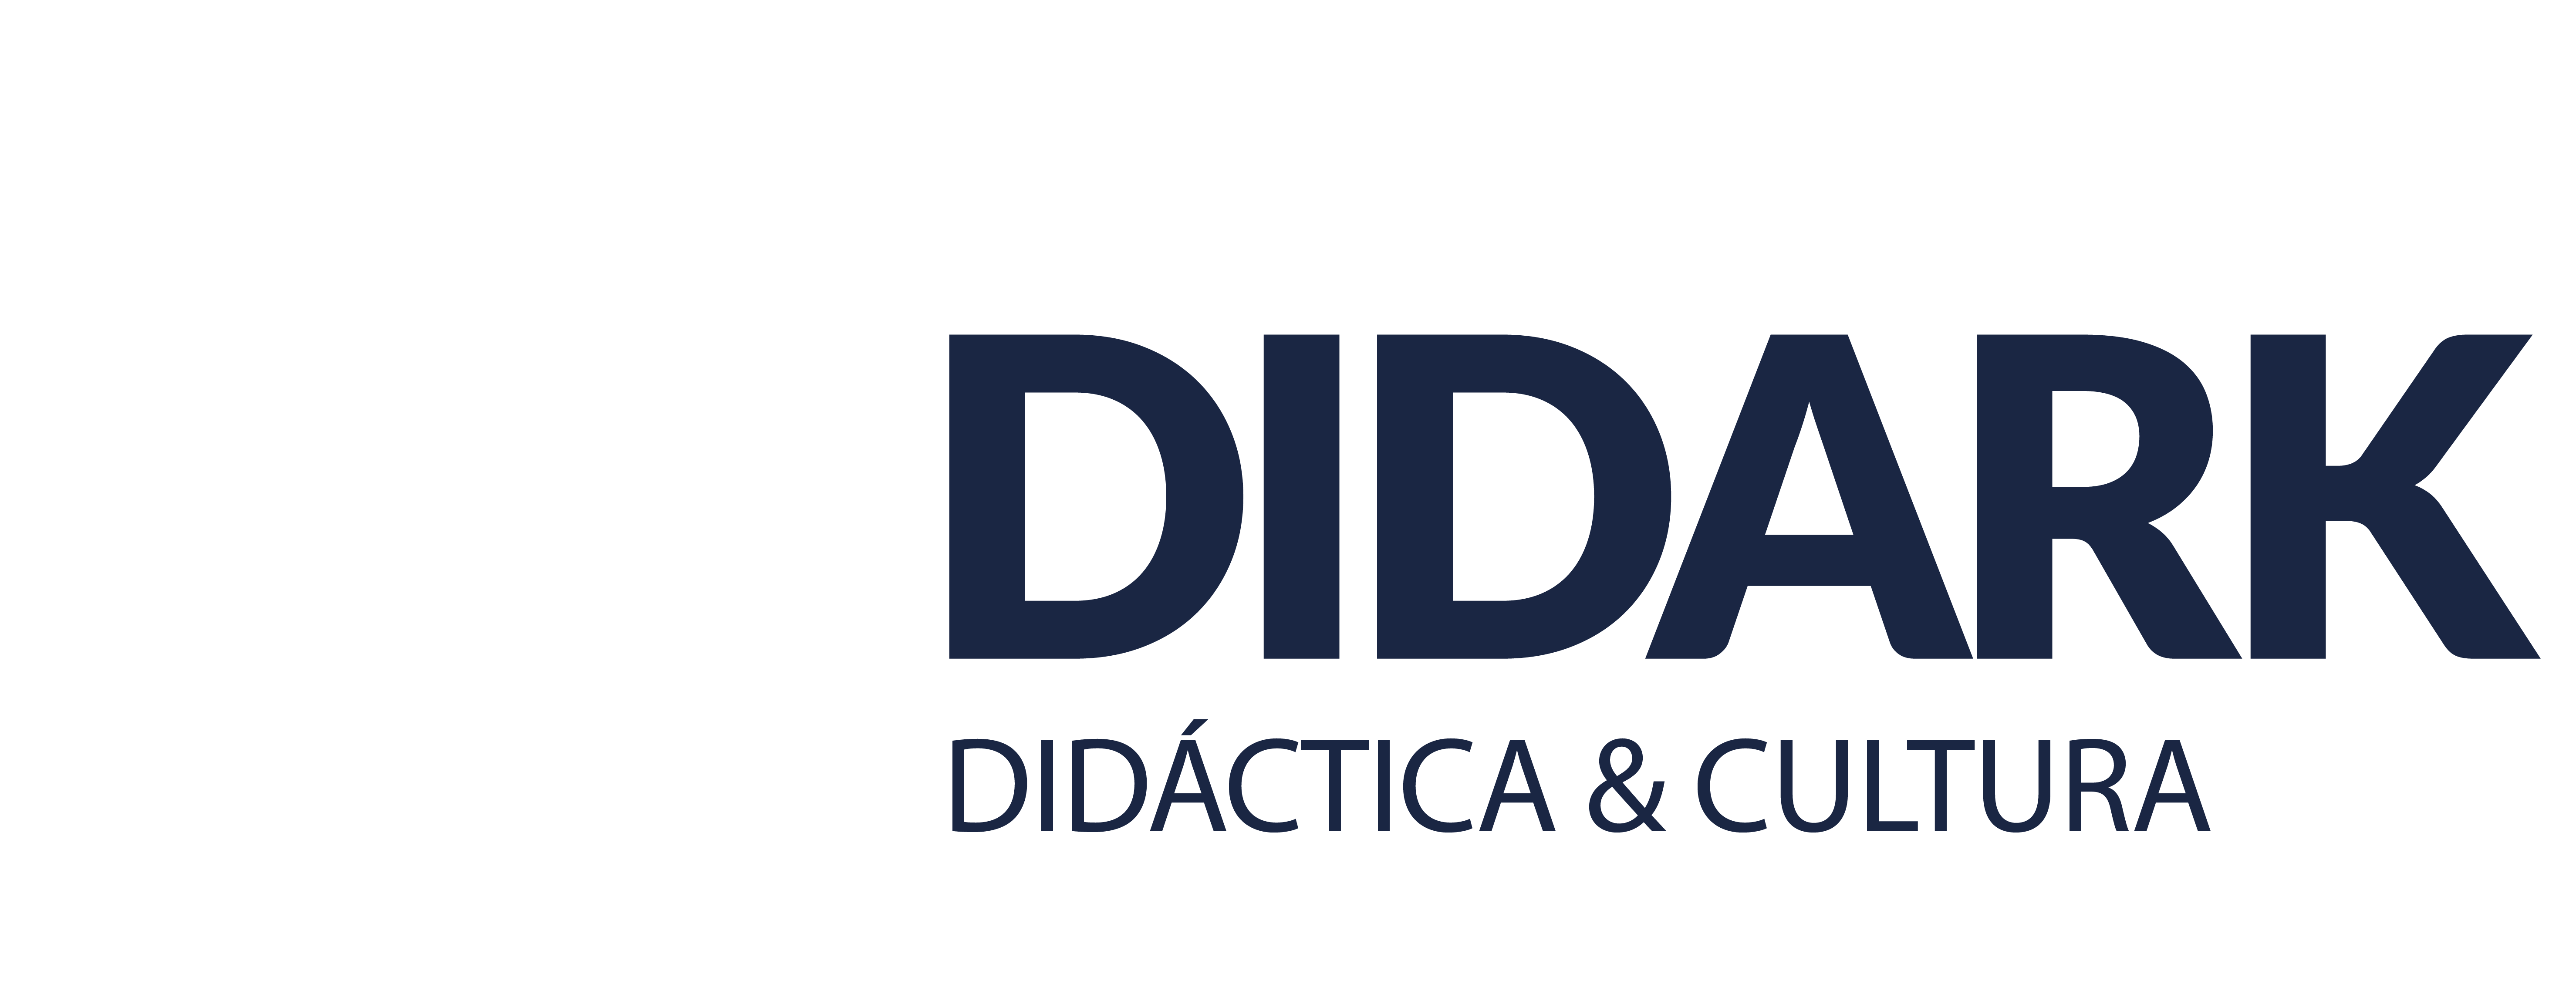 Logo blanco y azul didark